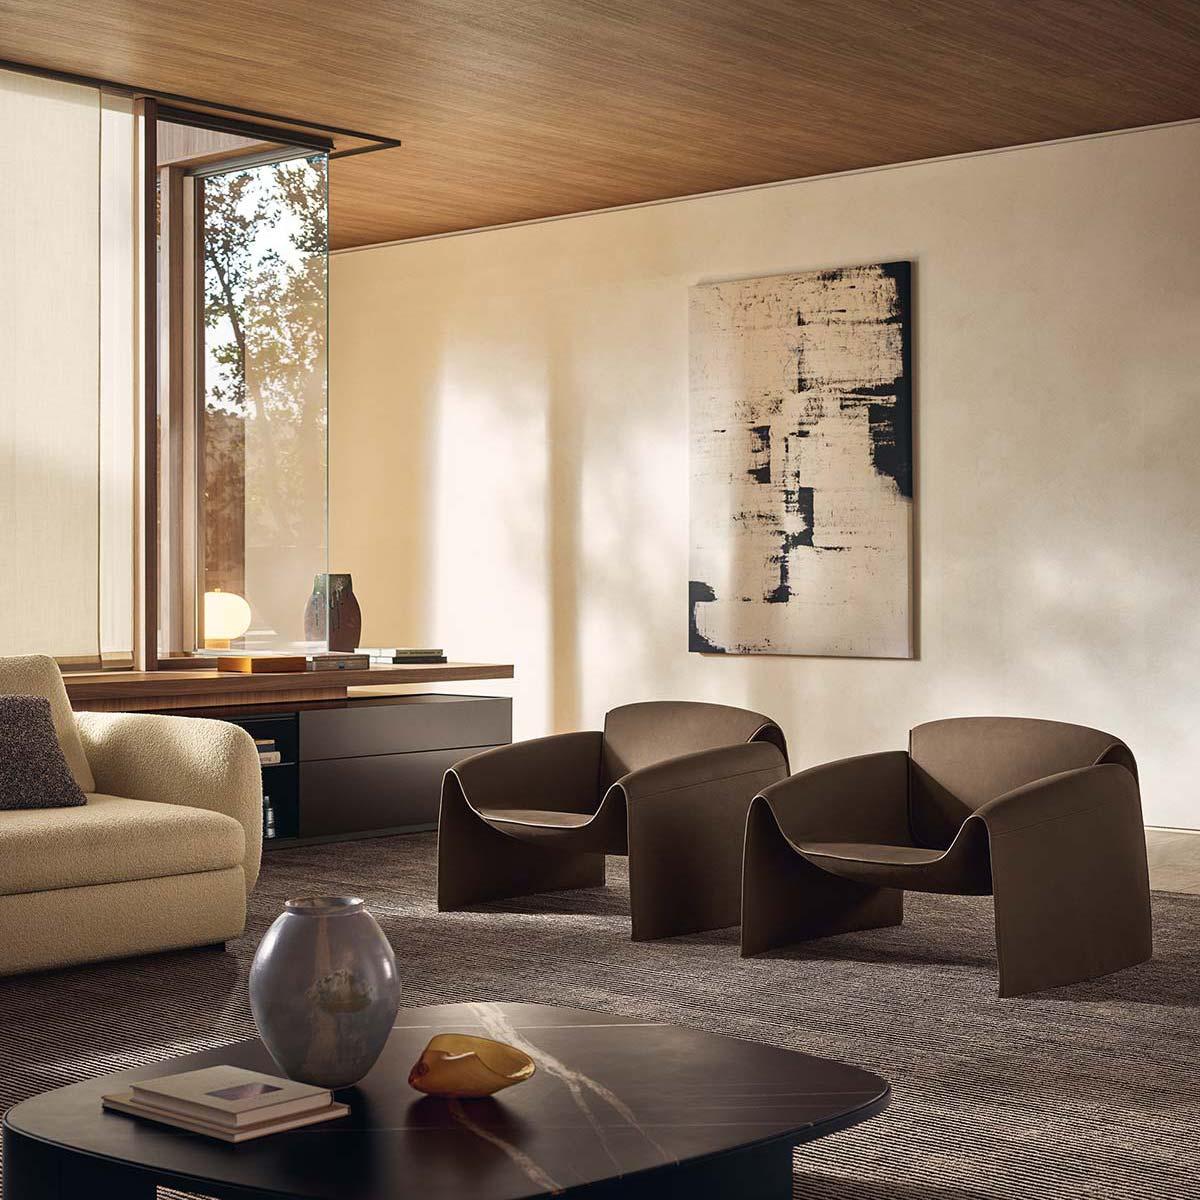 Le Club by Poliform, Design Jean-Marie Massaud